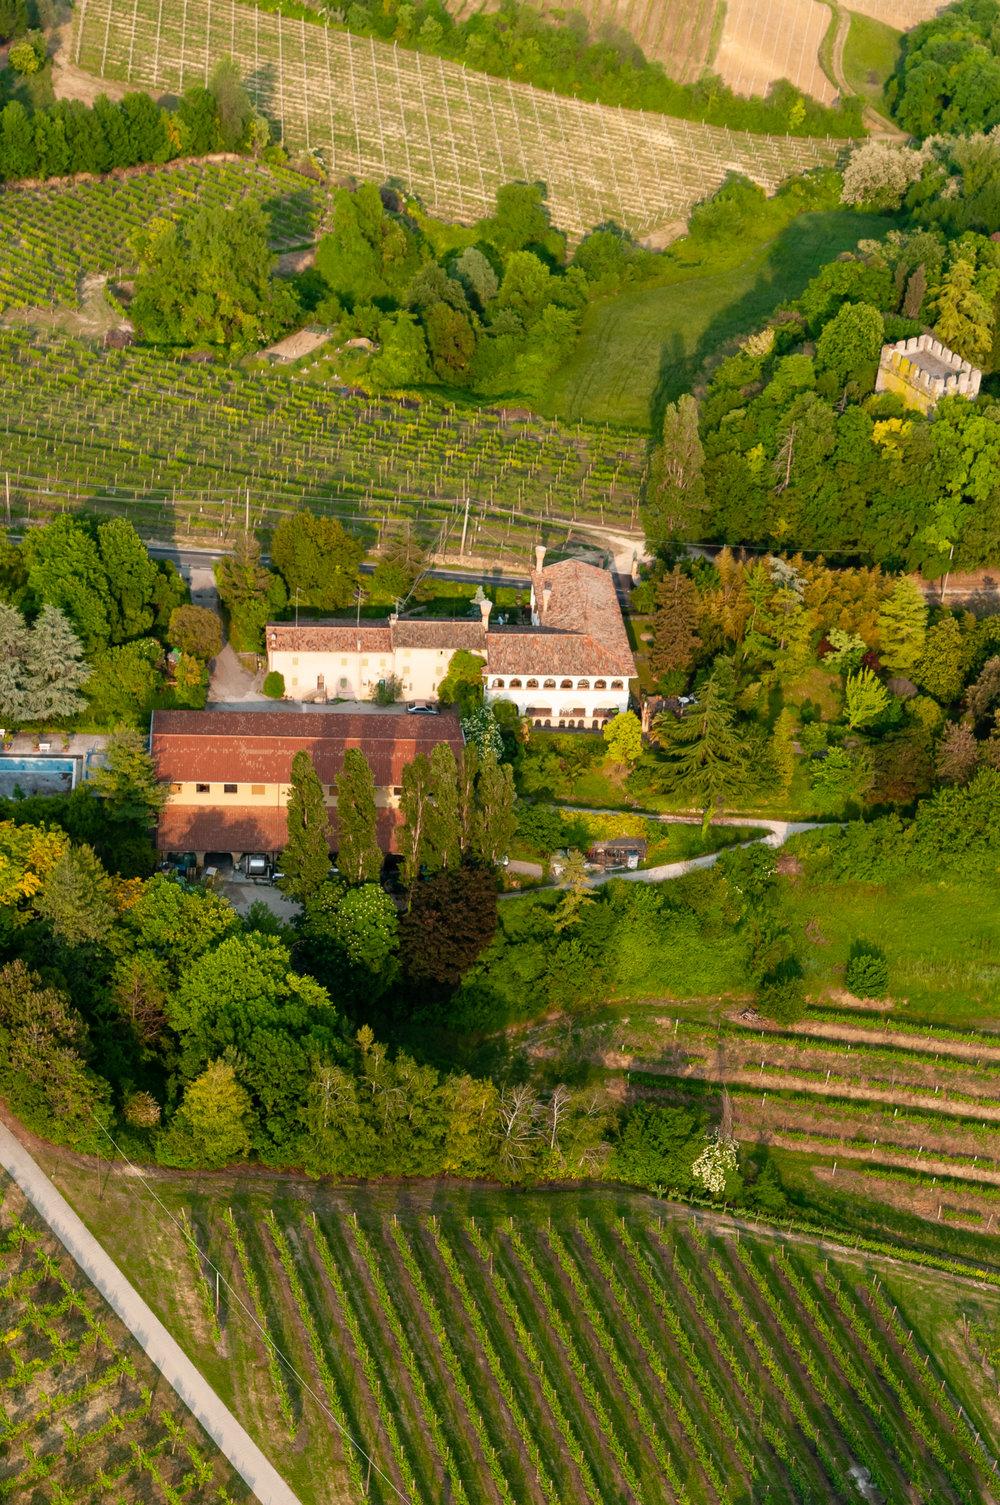 View of the Tenuta di Collalbrigo cellar and its surrounding vineyards.